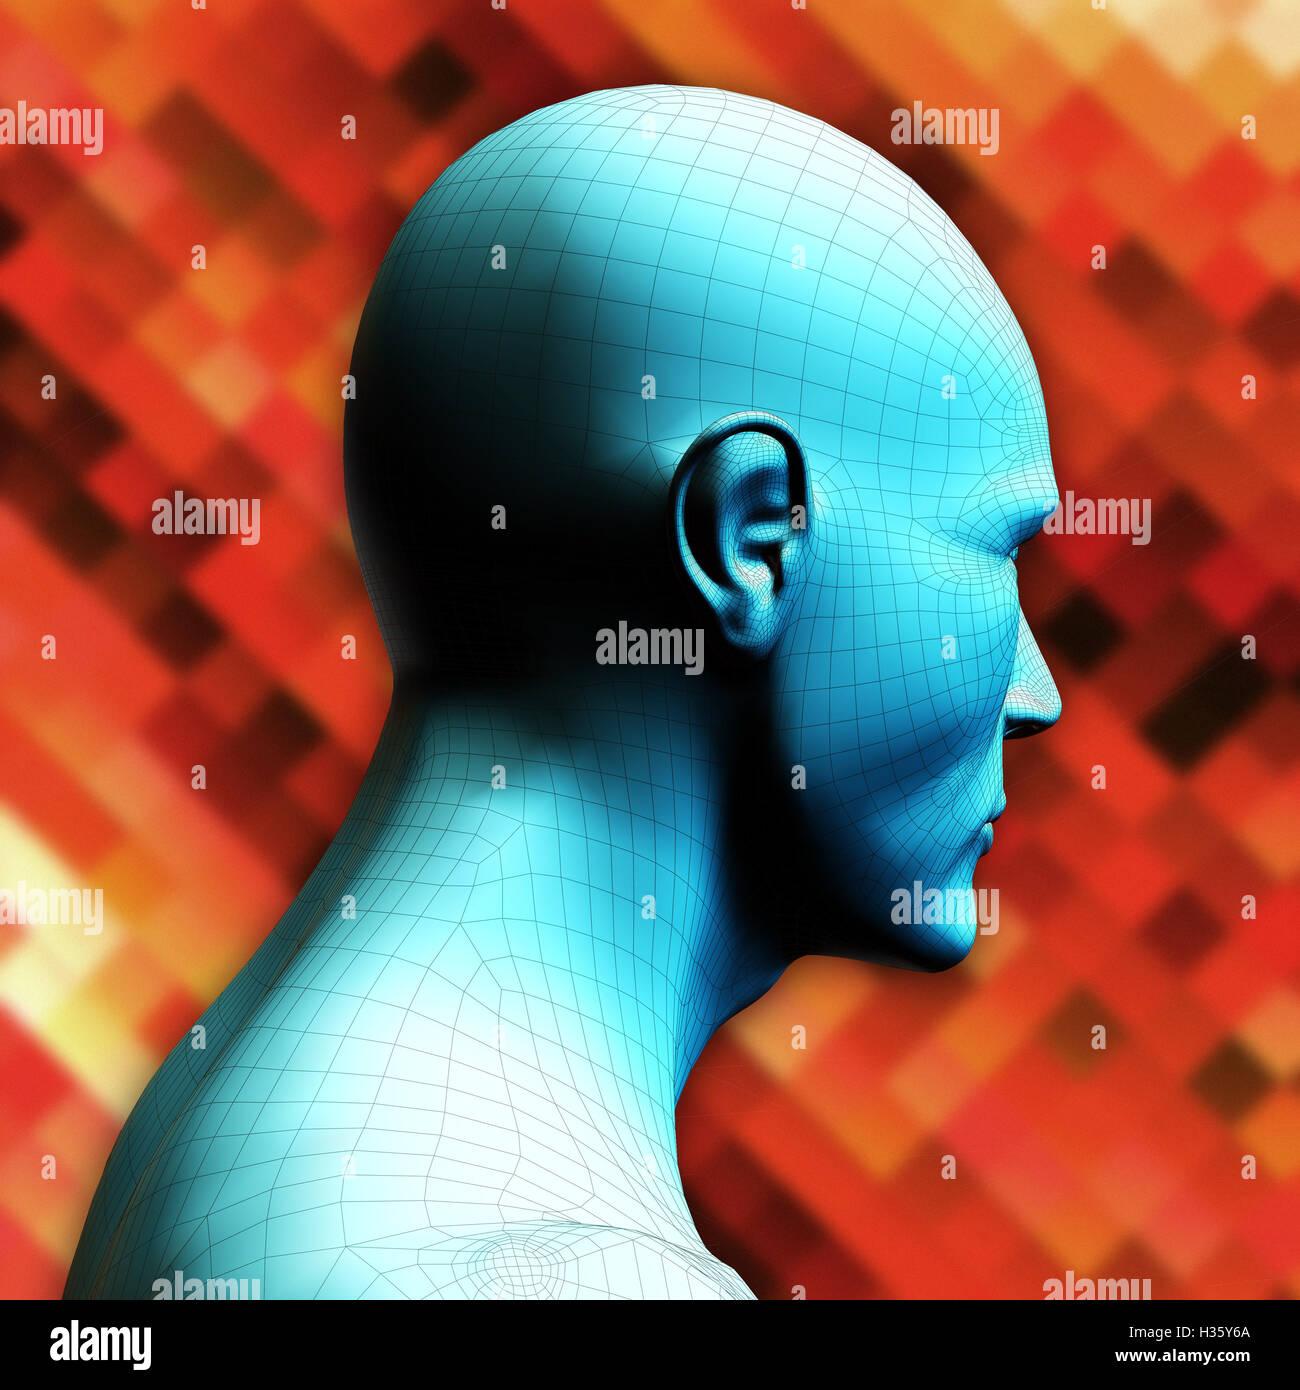 humanoid head - Stock Image